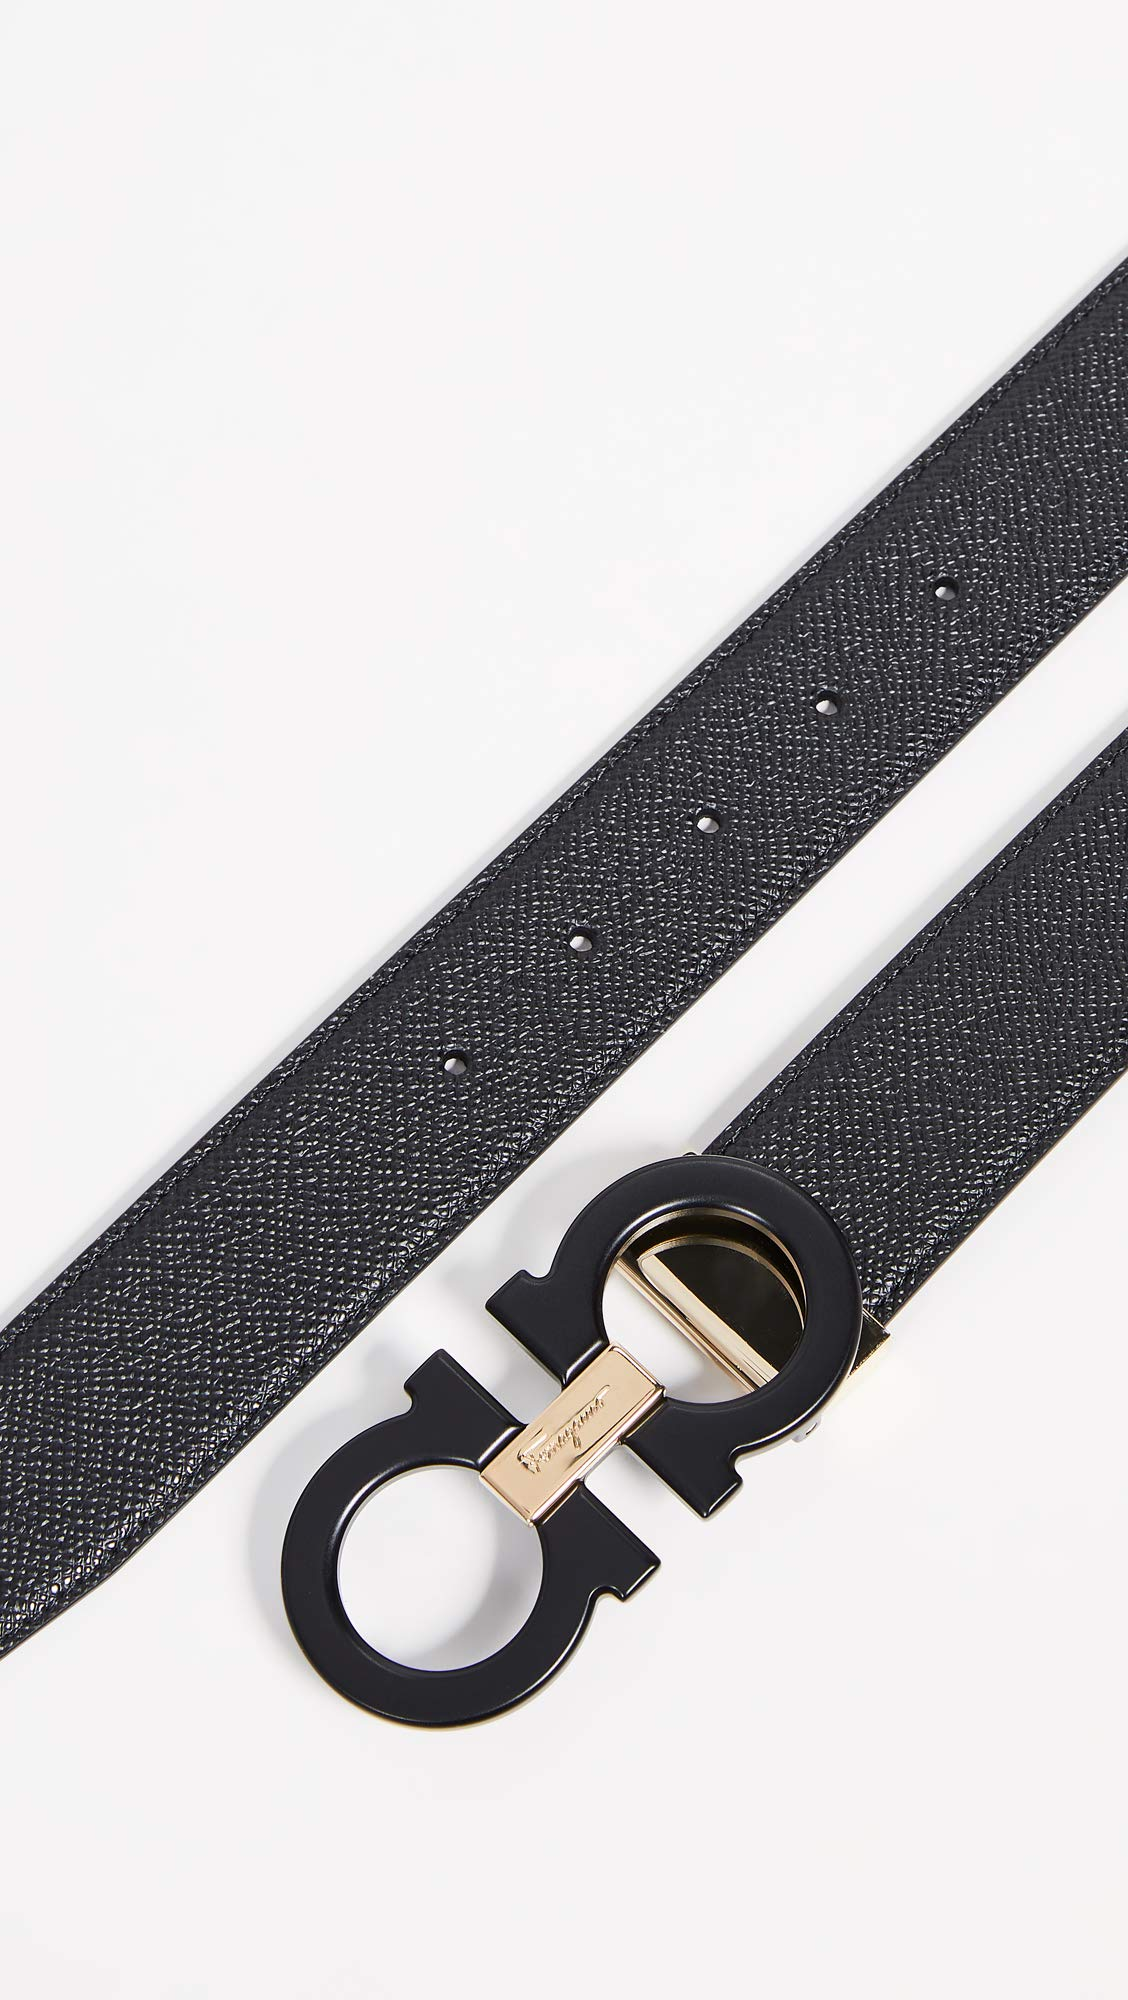 Salvatore Ferragamo Men's Double Gancini Reversible Belt, Nero Nero, Black, 38 by Salvatore Ferragamo (Image #4)